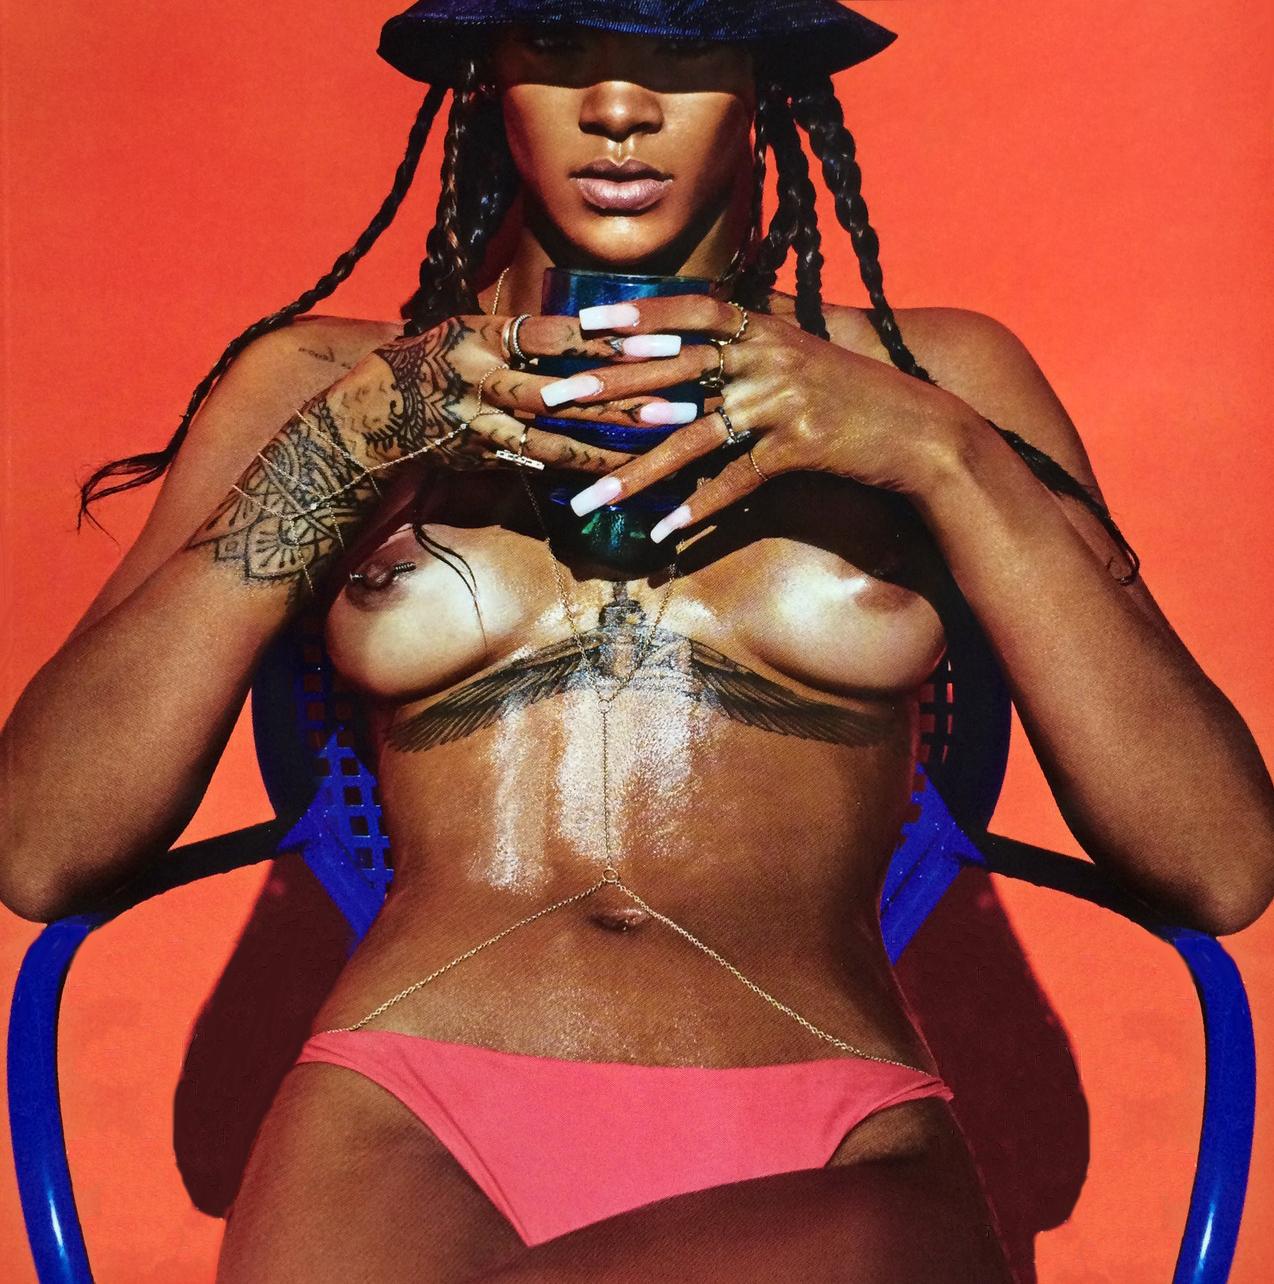 875434430_Rihanna_LuiMagazineFrance_2014_005_123_843lo.jpg